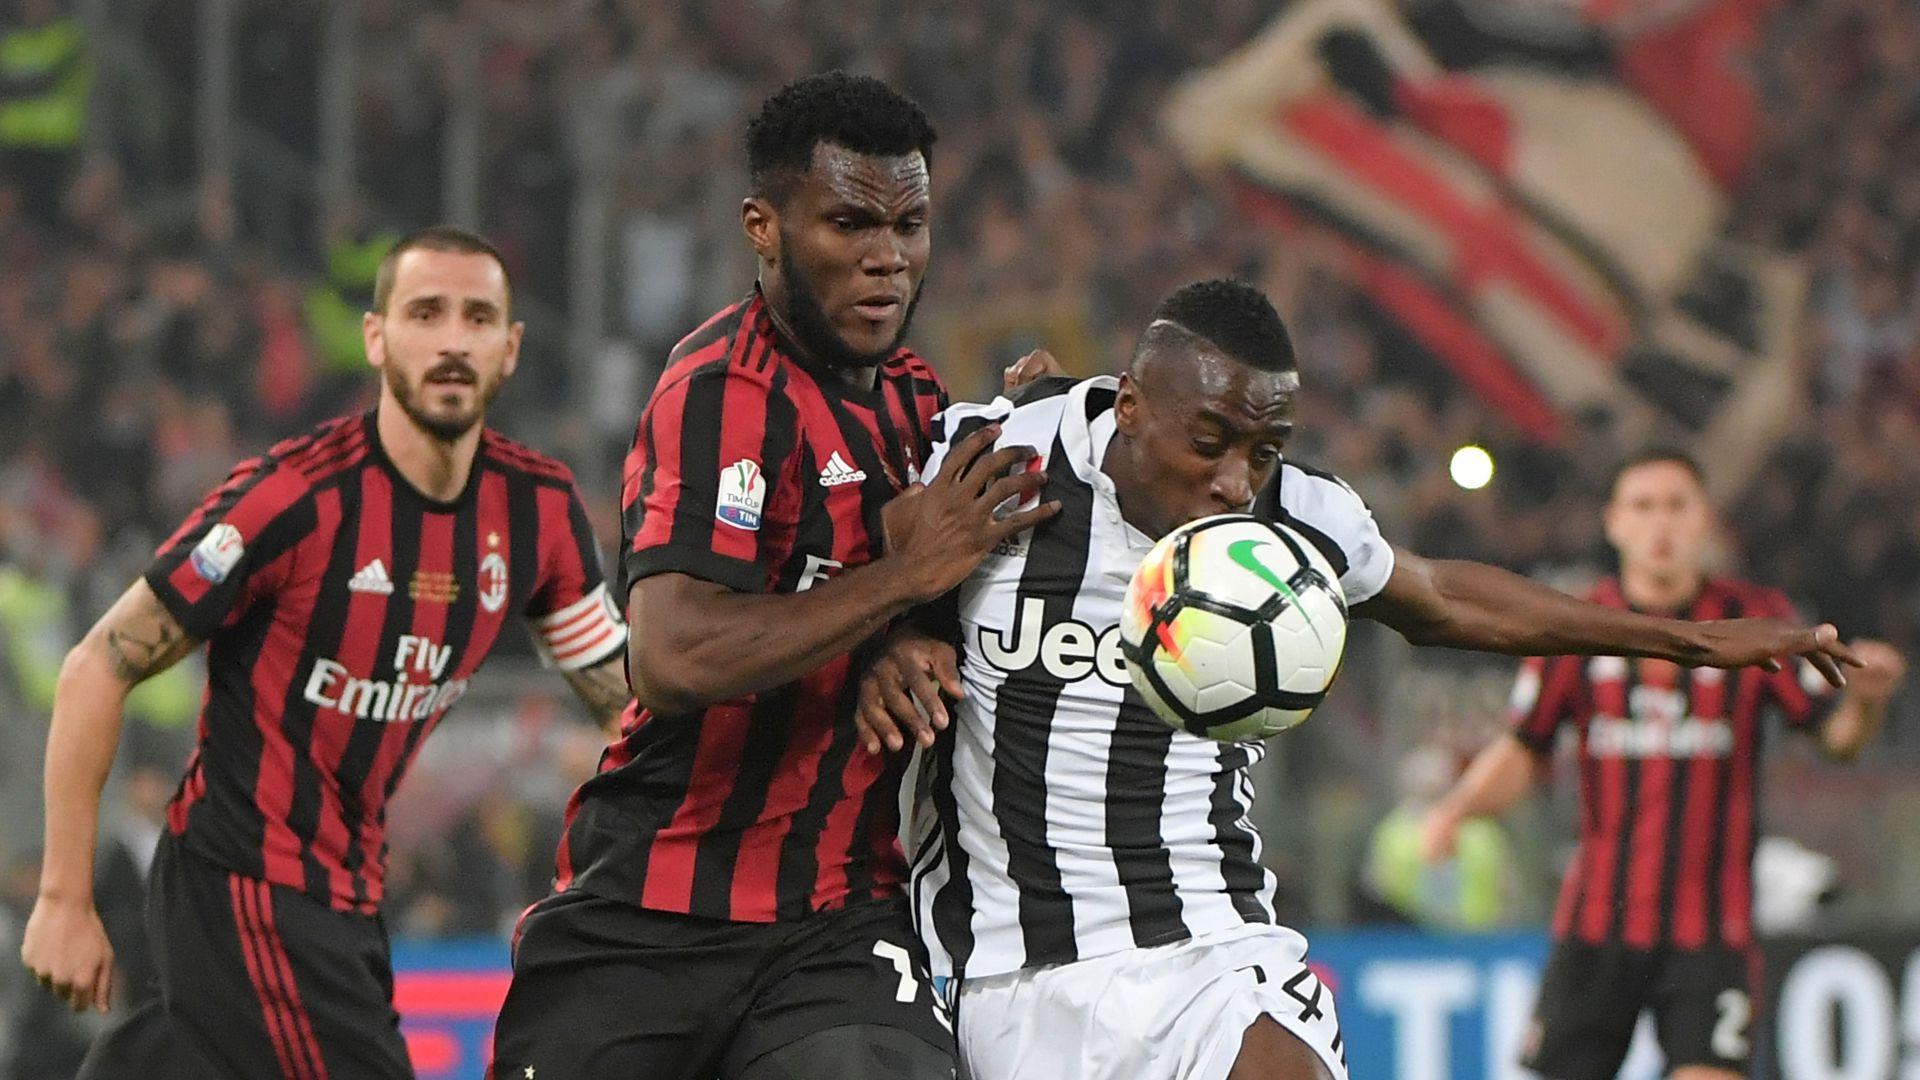 La Supercoppa Italiana trasloca in Arabia Saudita. Juve-Milan nel gennaio 2019